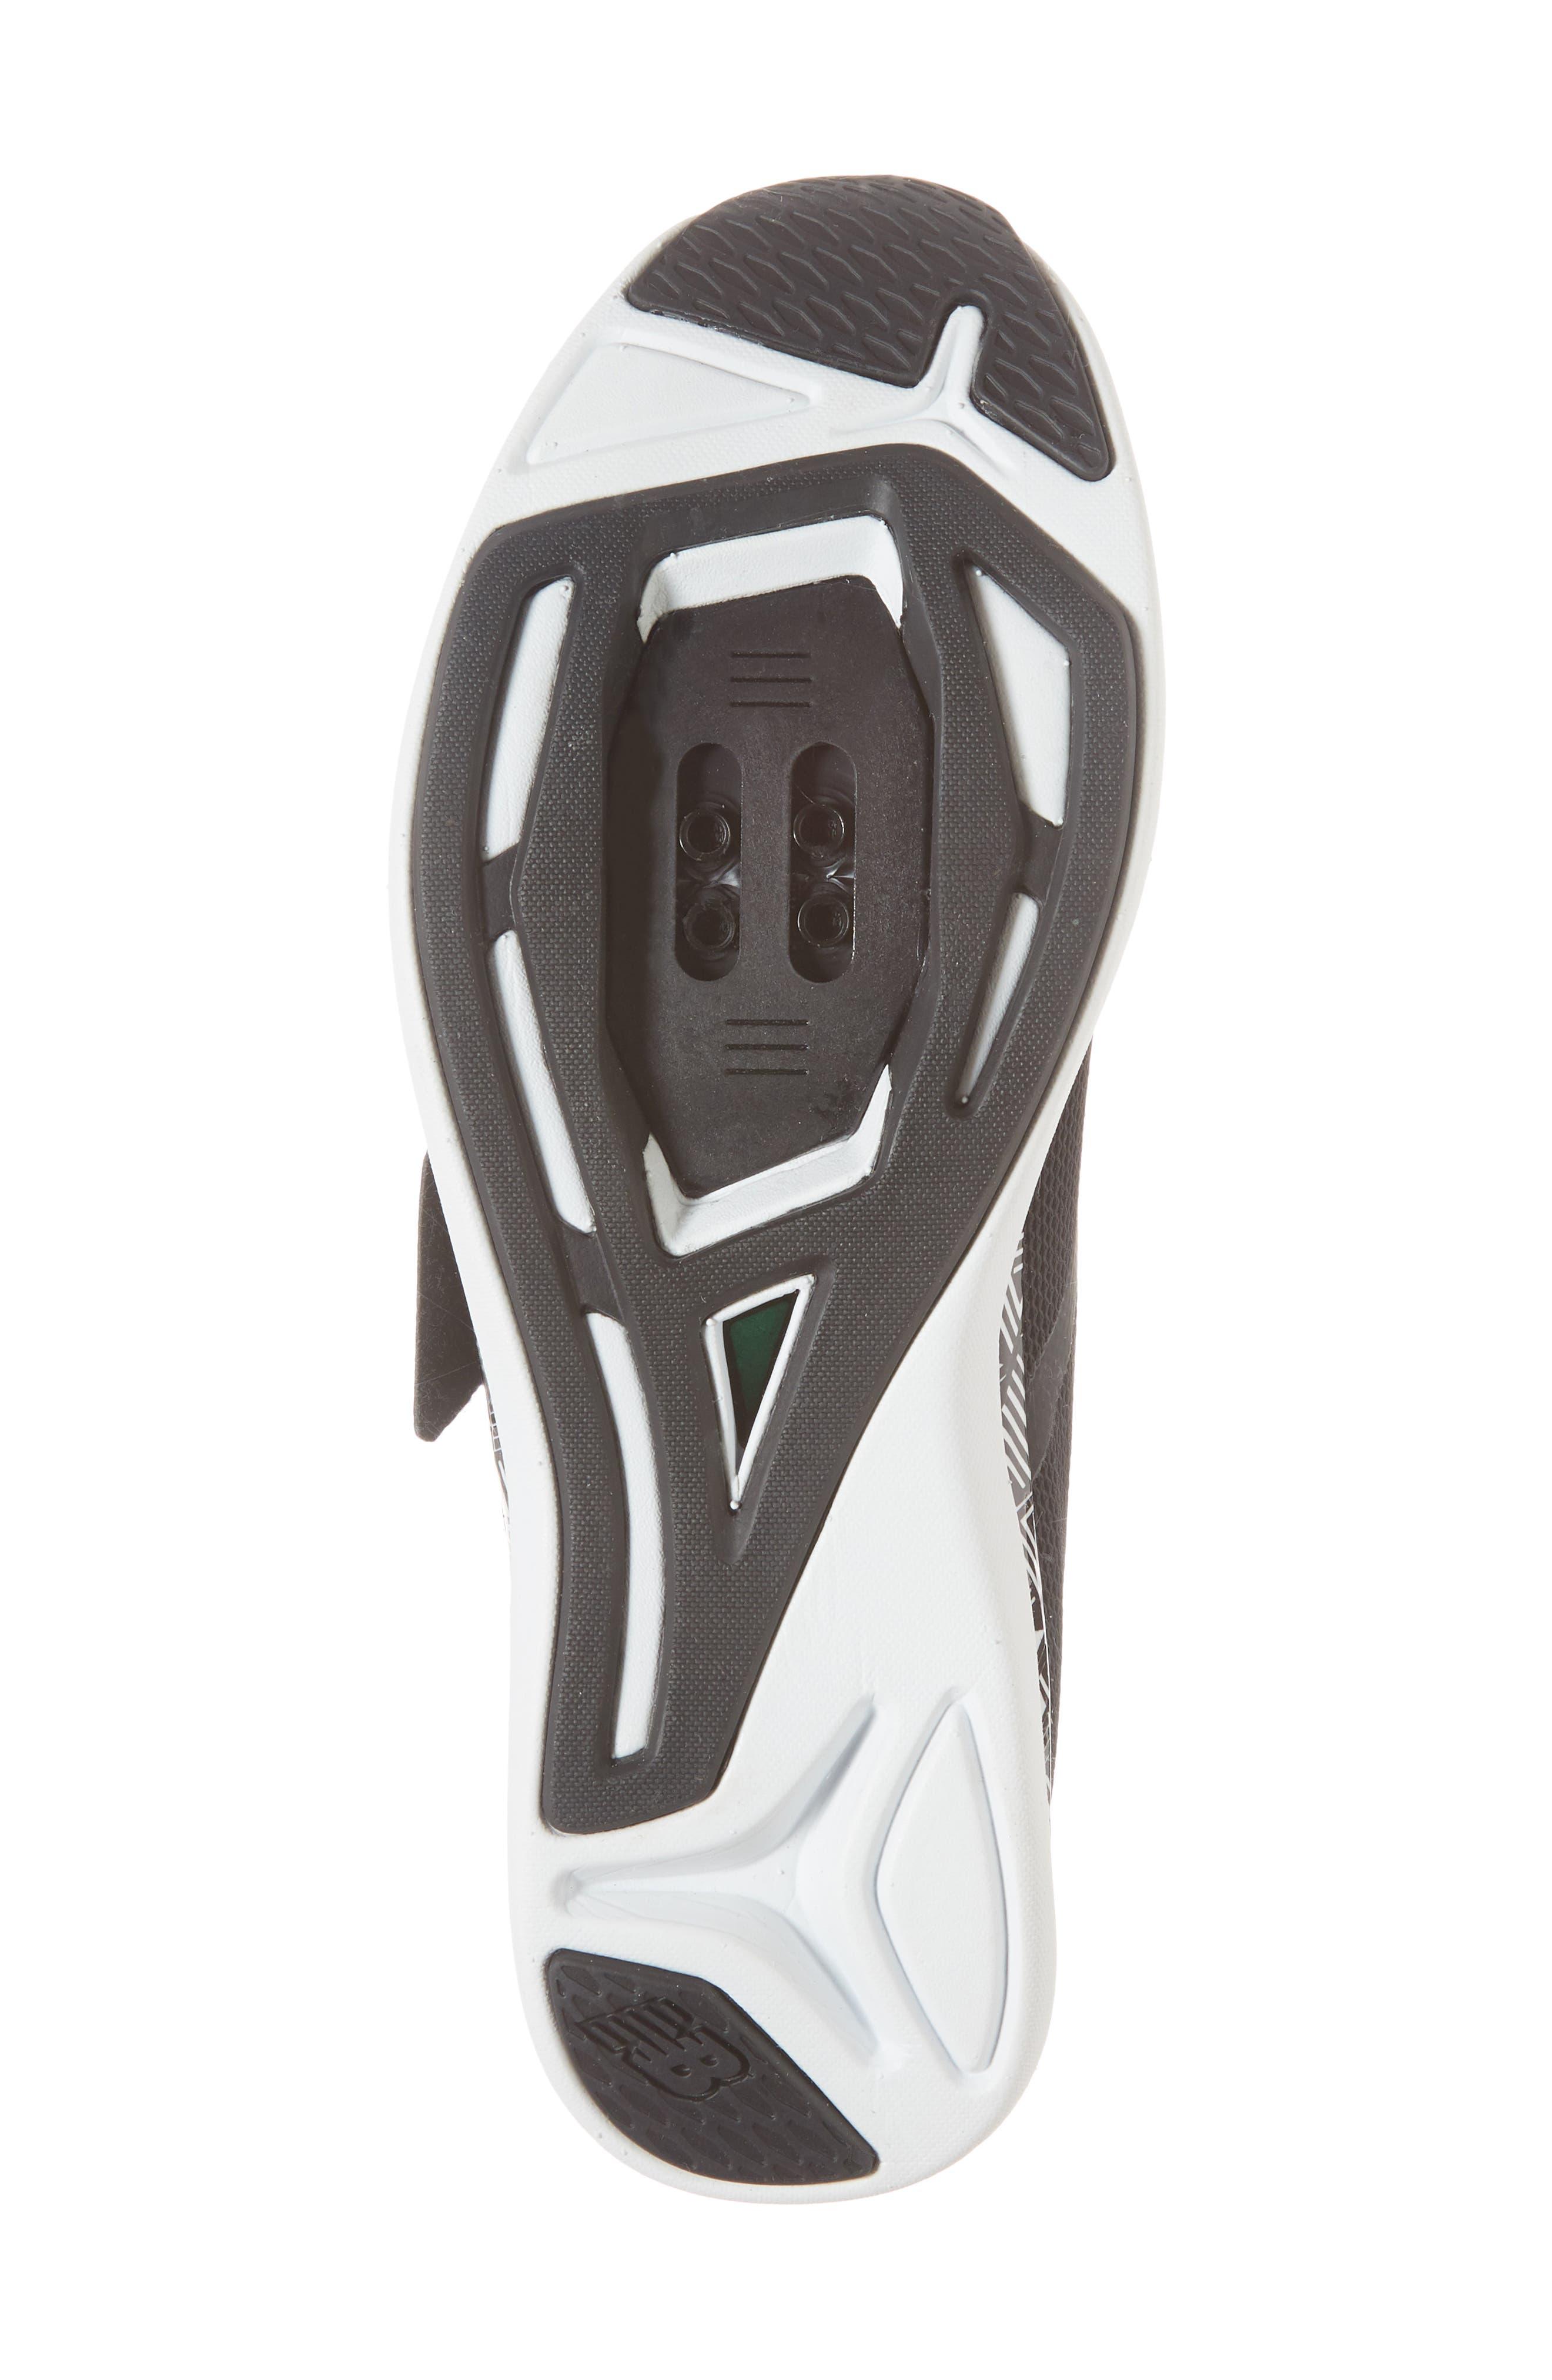 Spin 09 Cycling Shoe,                             Alternate thumbnail 6, color,                             BLACK/ WHITE